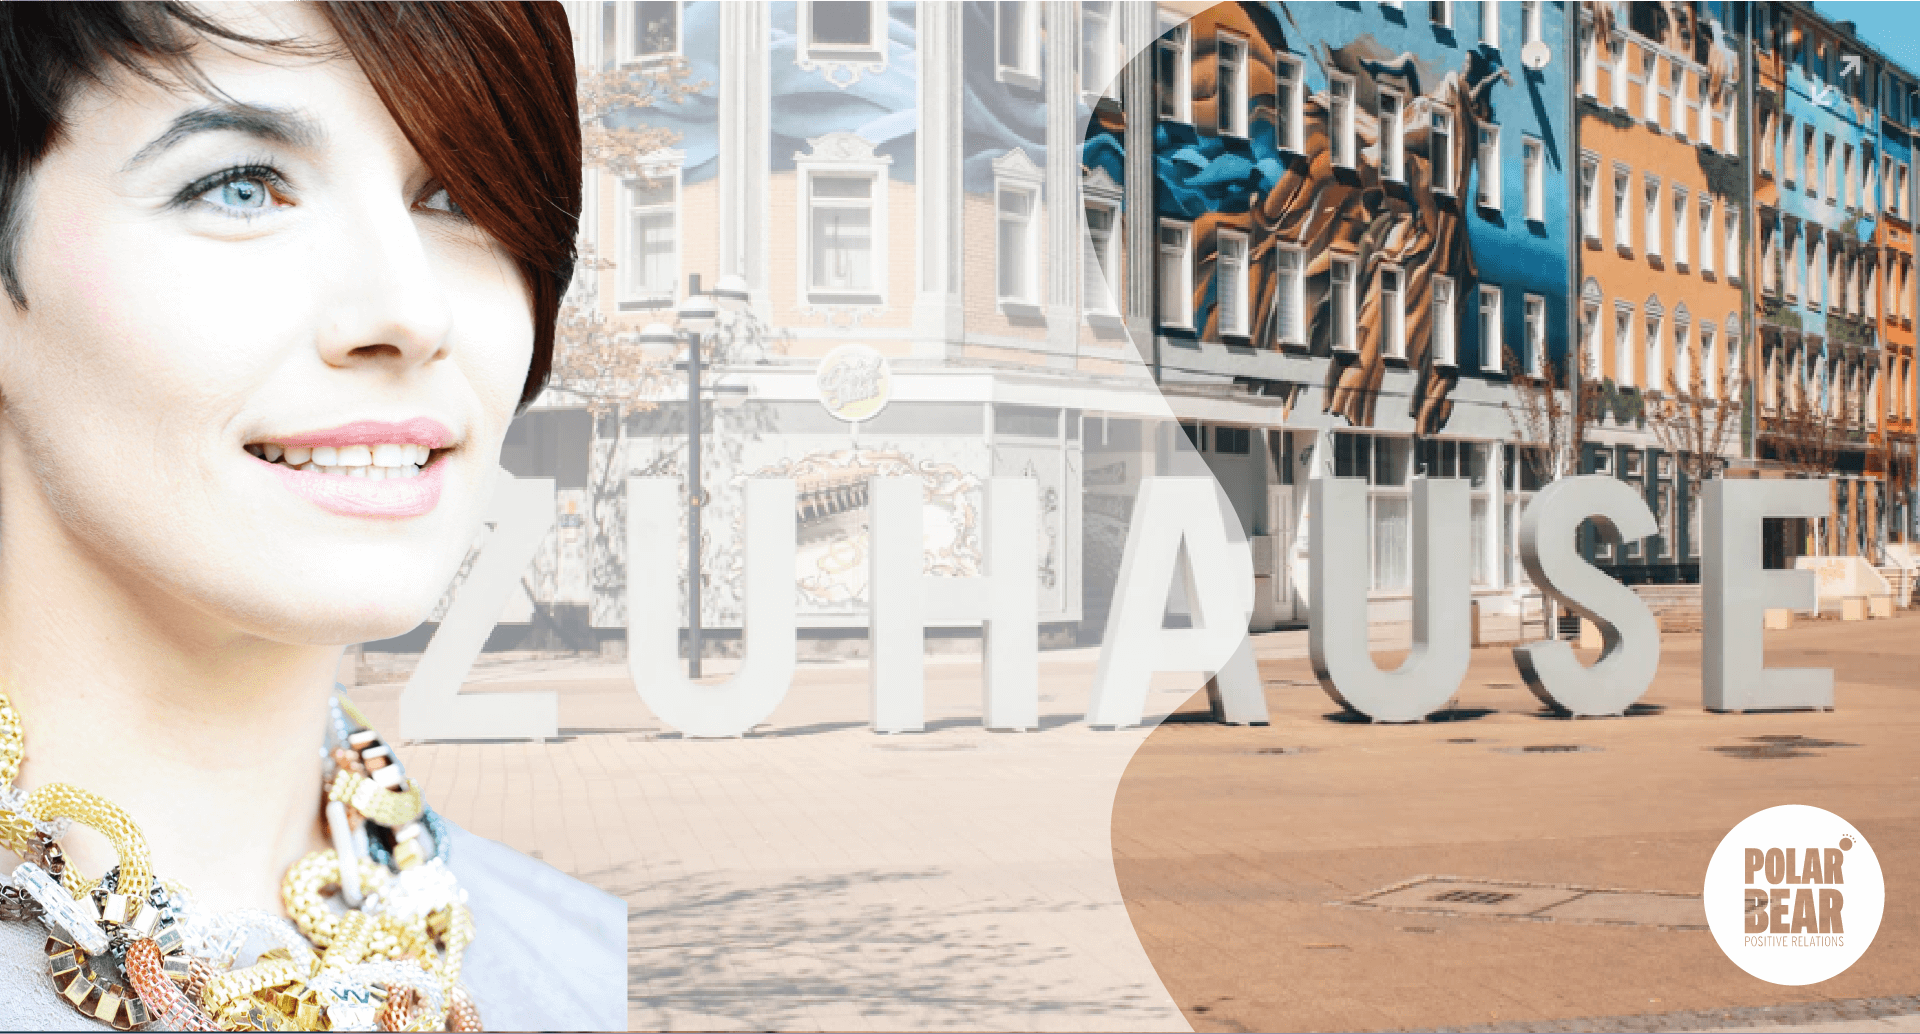 Claudia Gersdorf und Chemnitz Kulturhauptstadt 2025